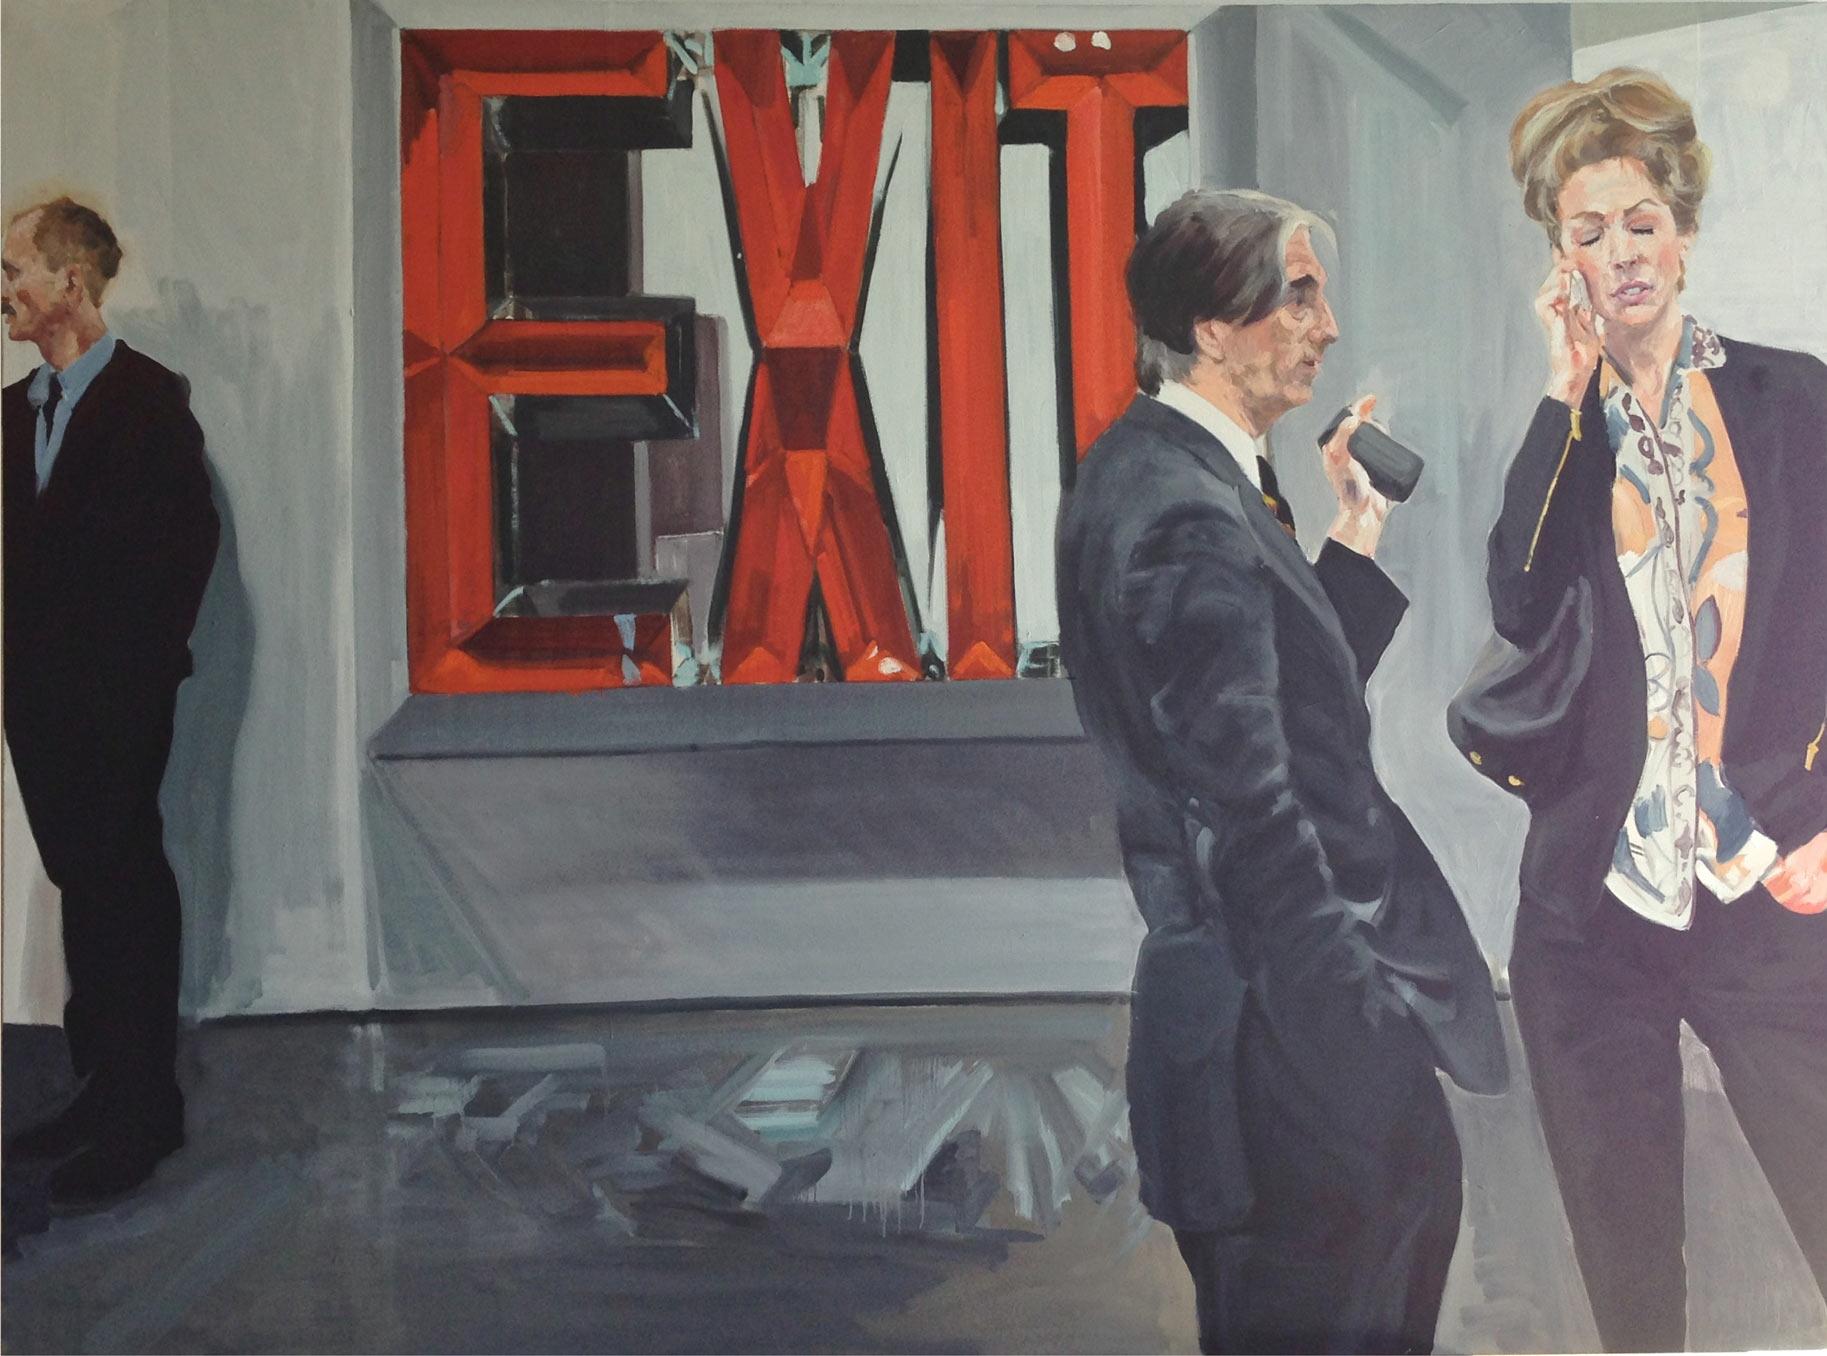 Art Fair: Booth #1 EXIT, 2014. Oil on Linen. 82 x 110 in. (208 x 279 cm.)